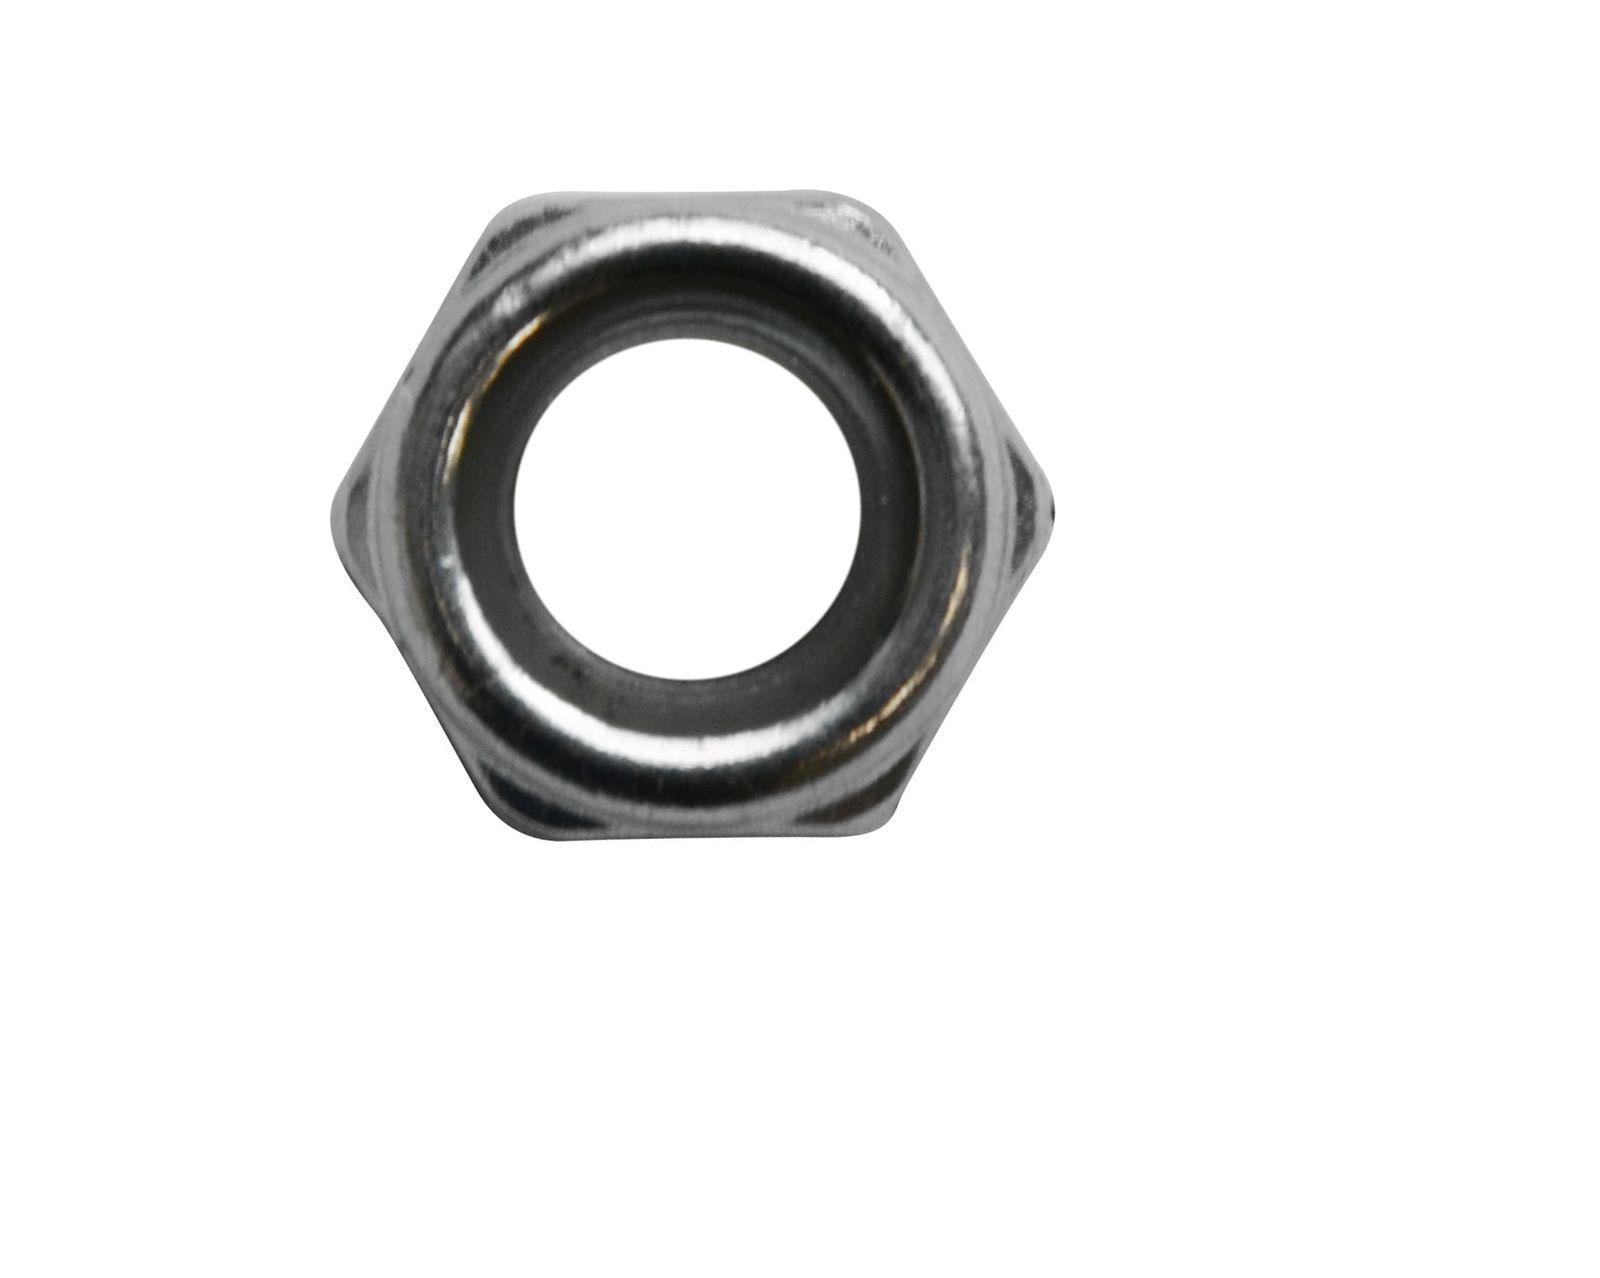 Nut M 8 high self-locking  – Bild 1